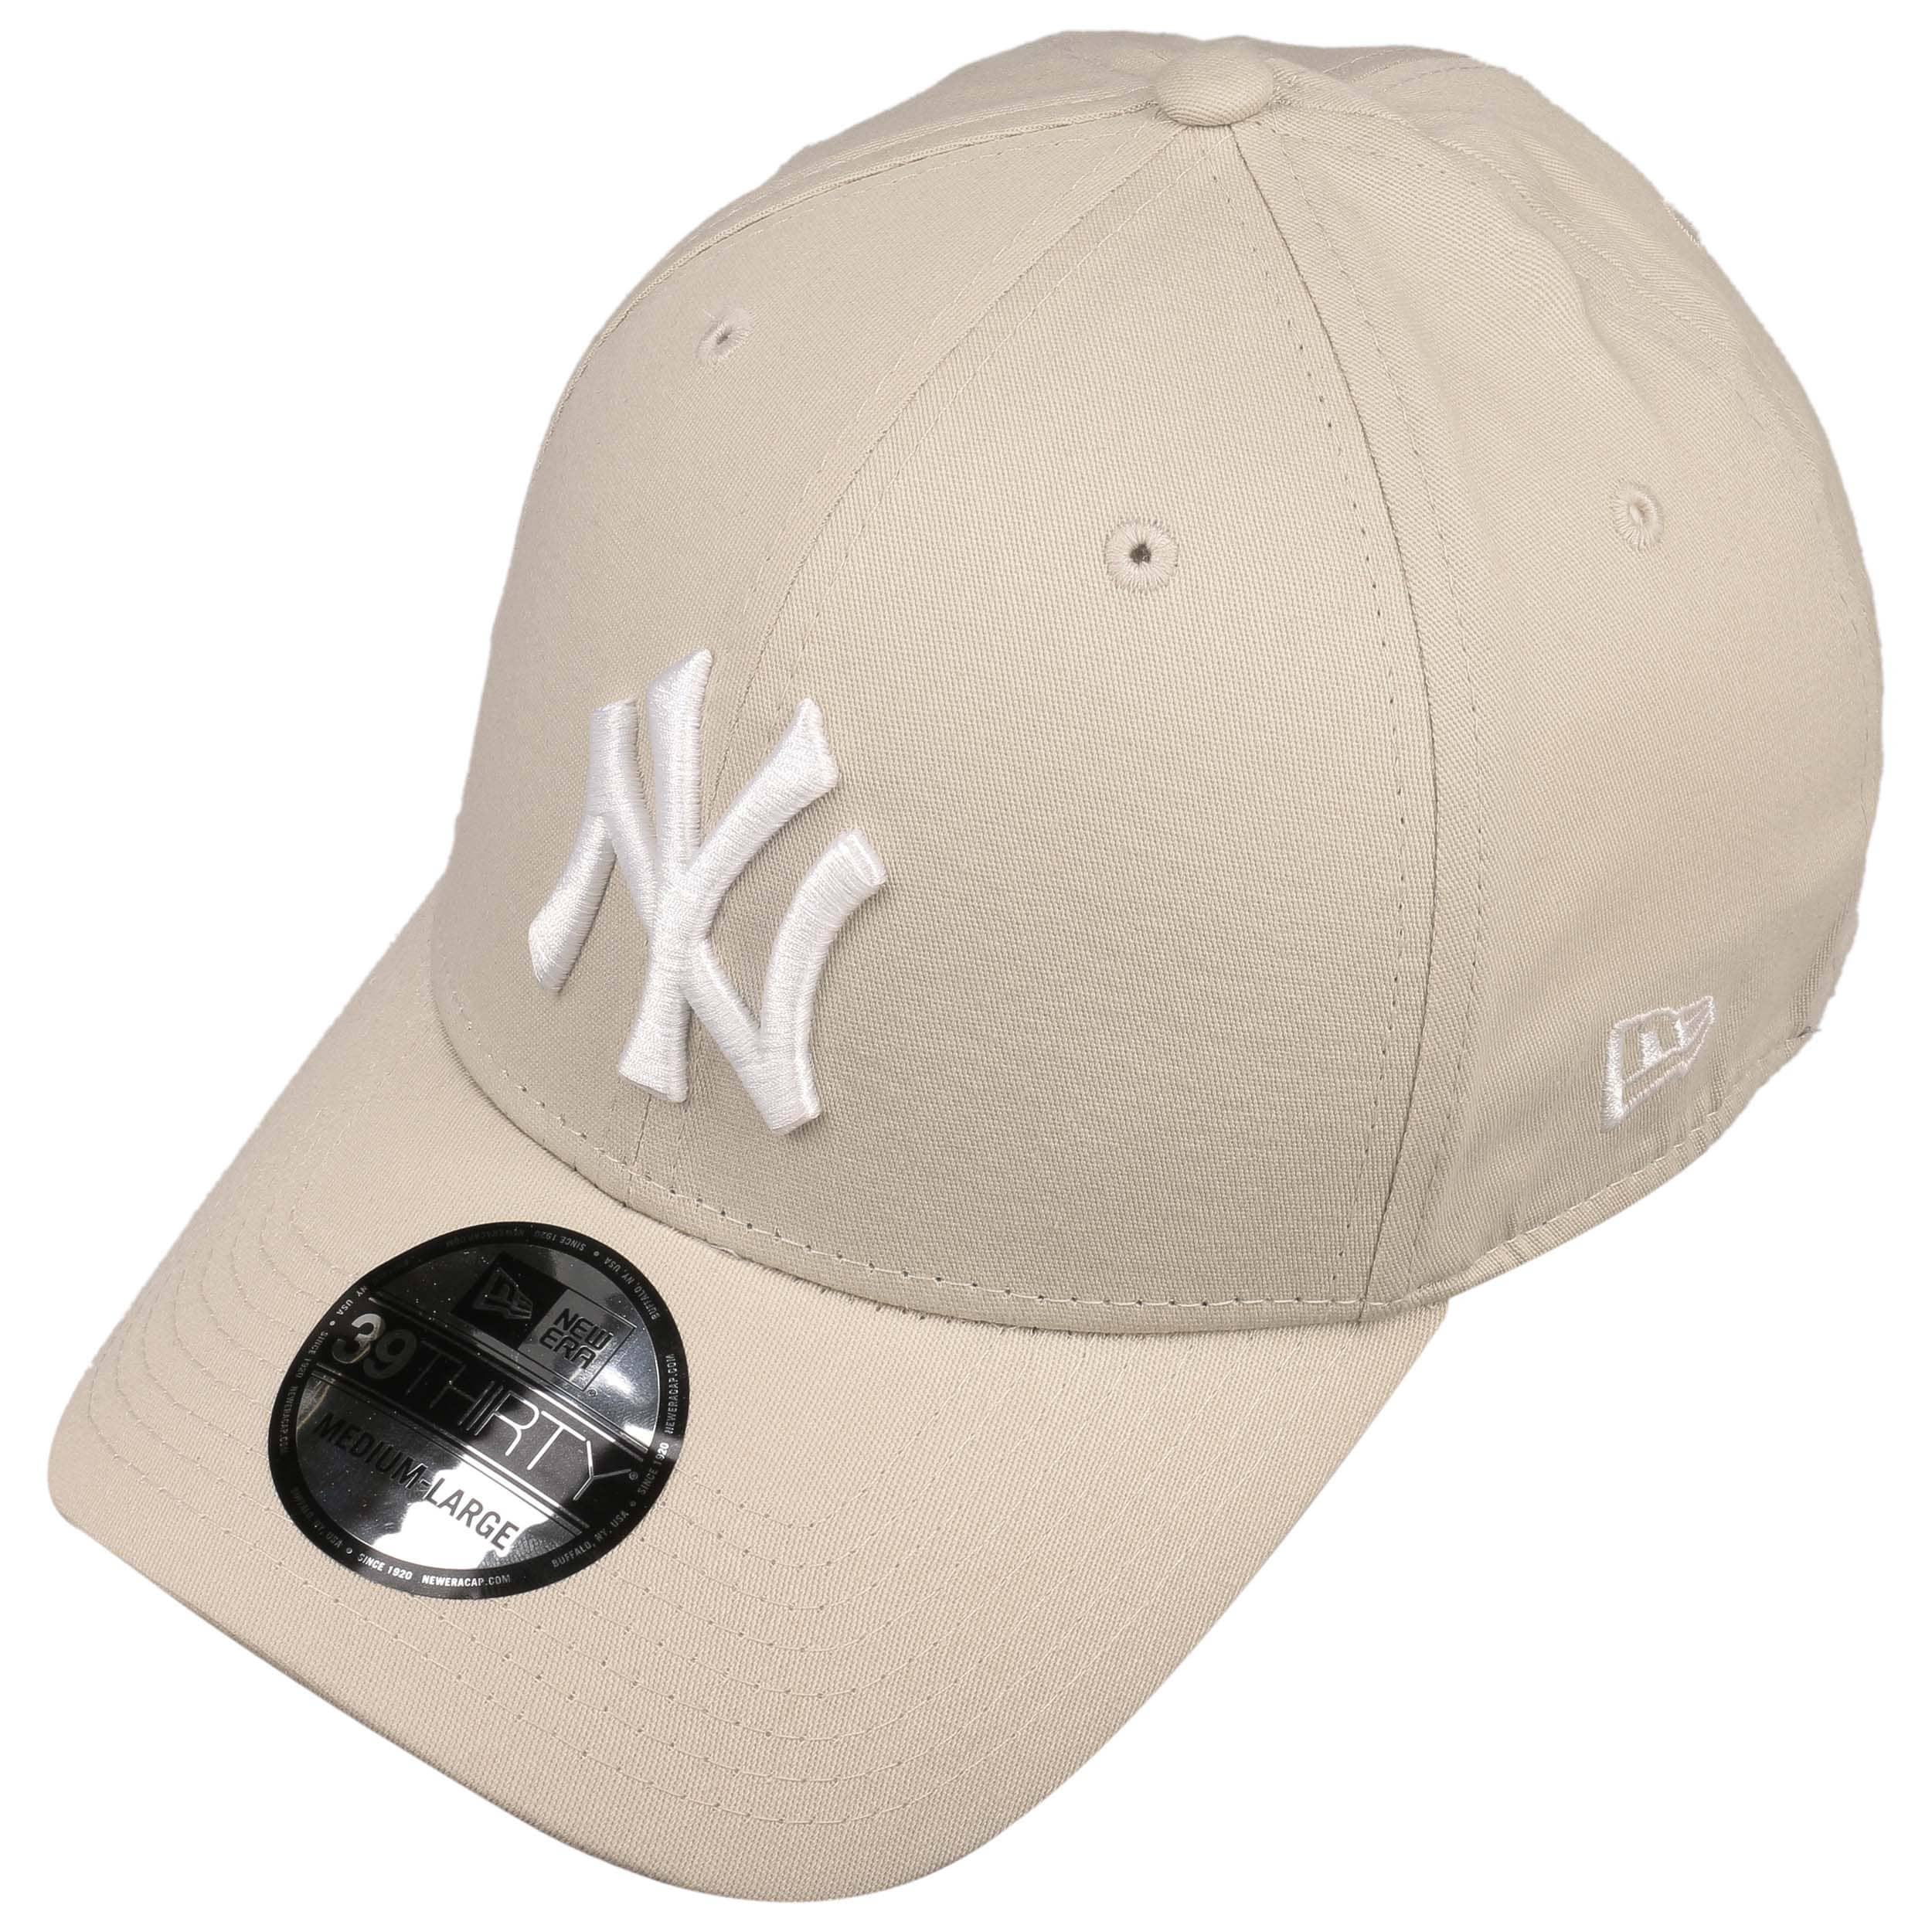 ... 39Thirty League Ess Yankees Cap by New Era - oatmeal 1 ... 5e1699e8f5e